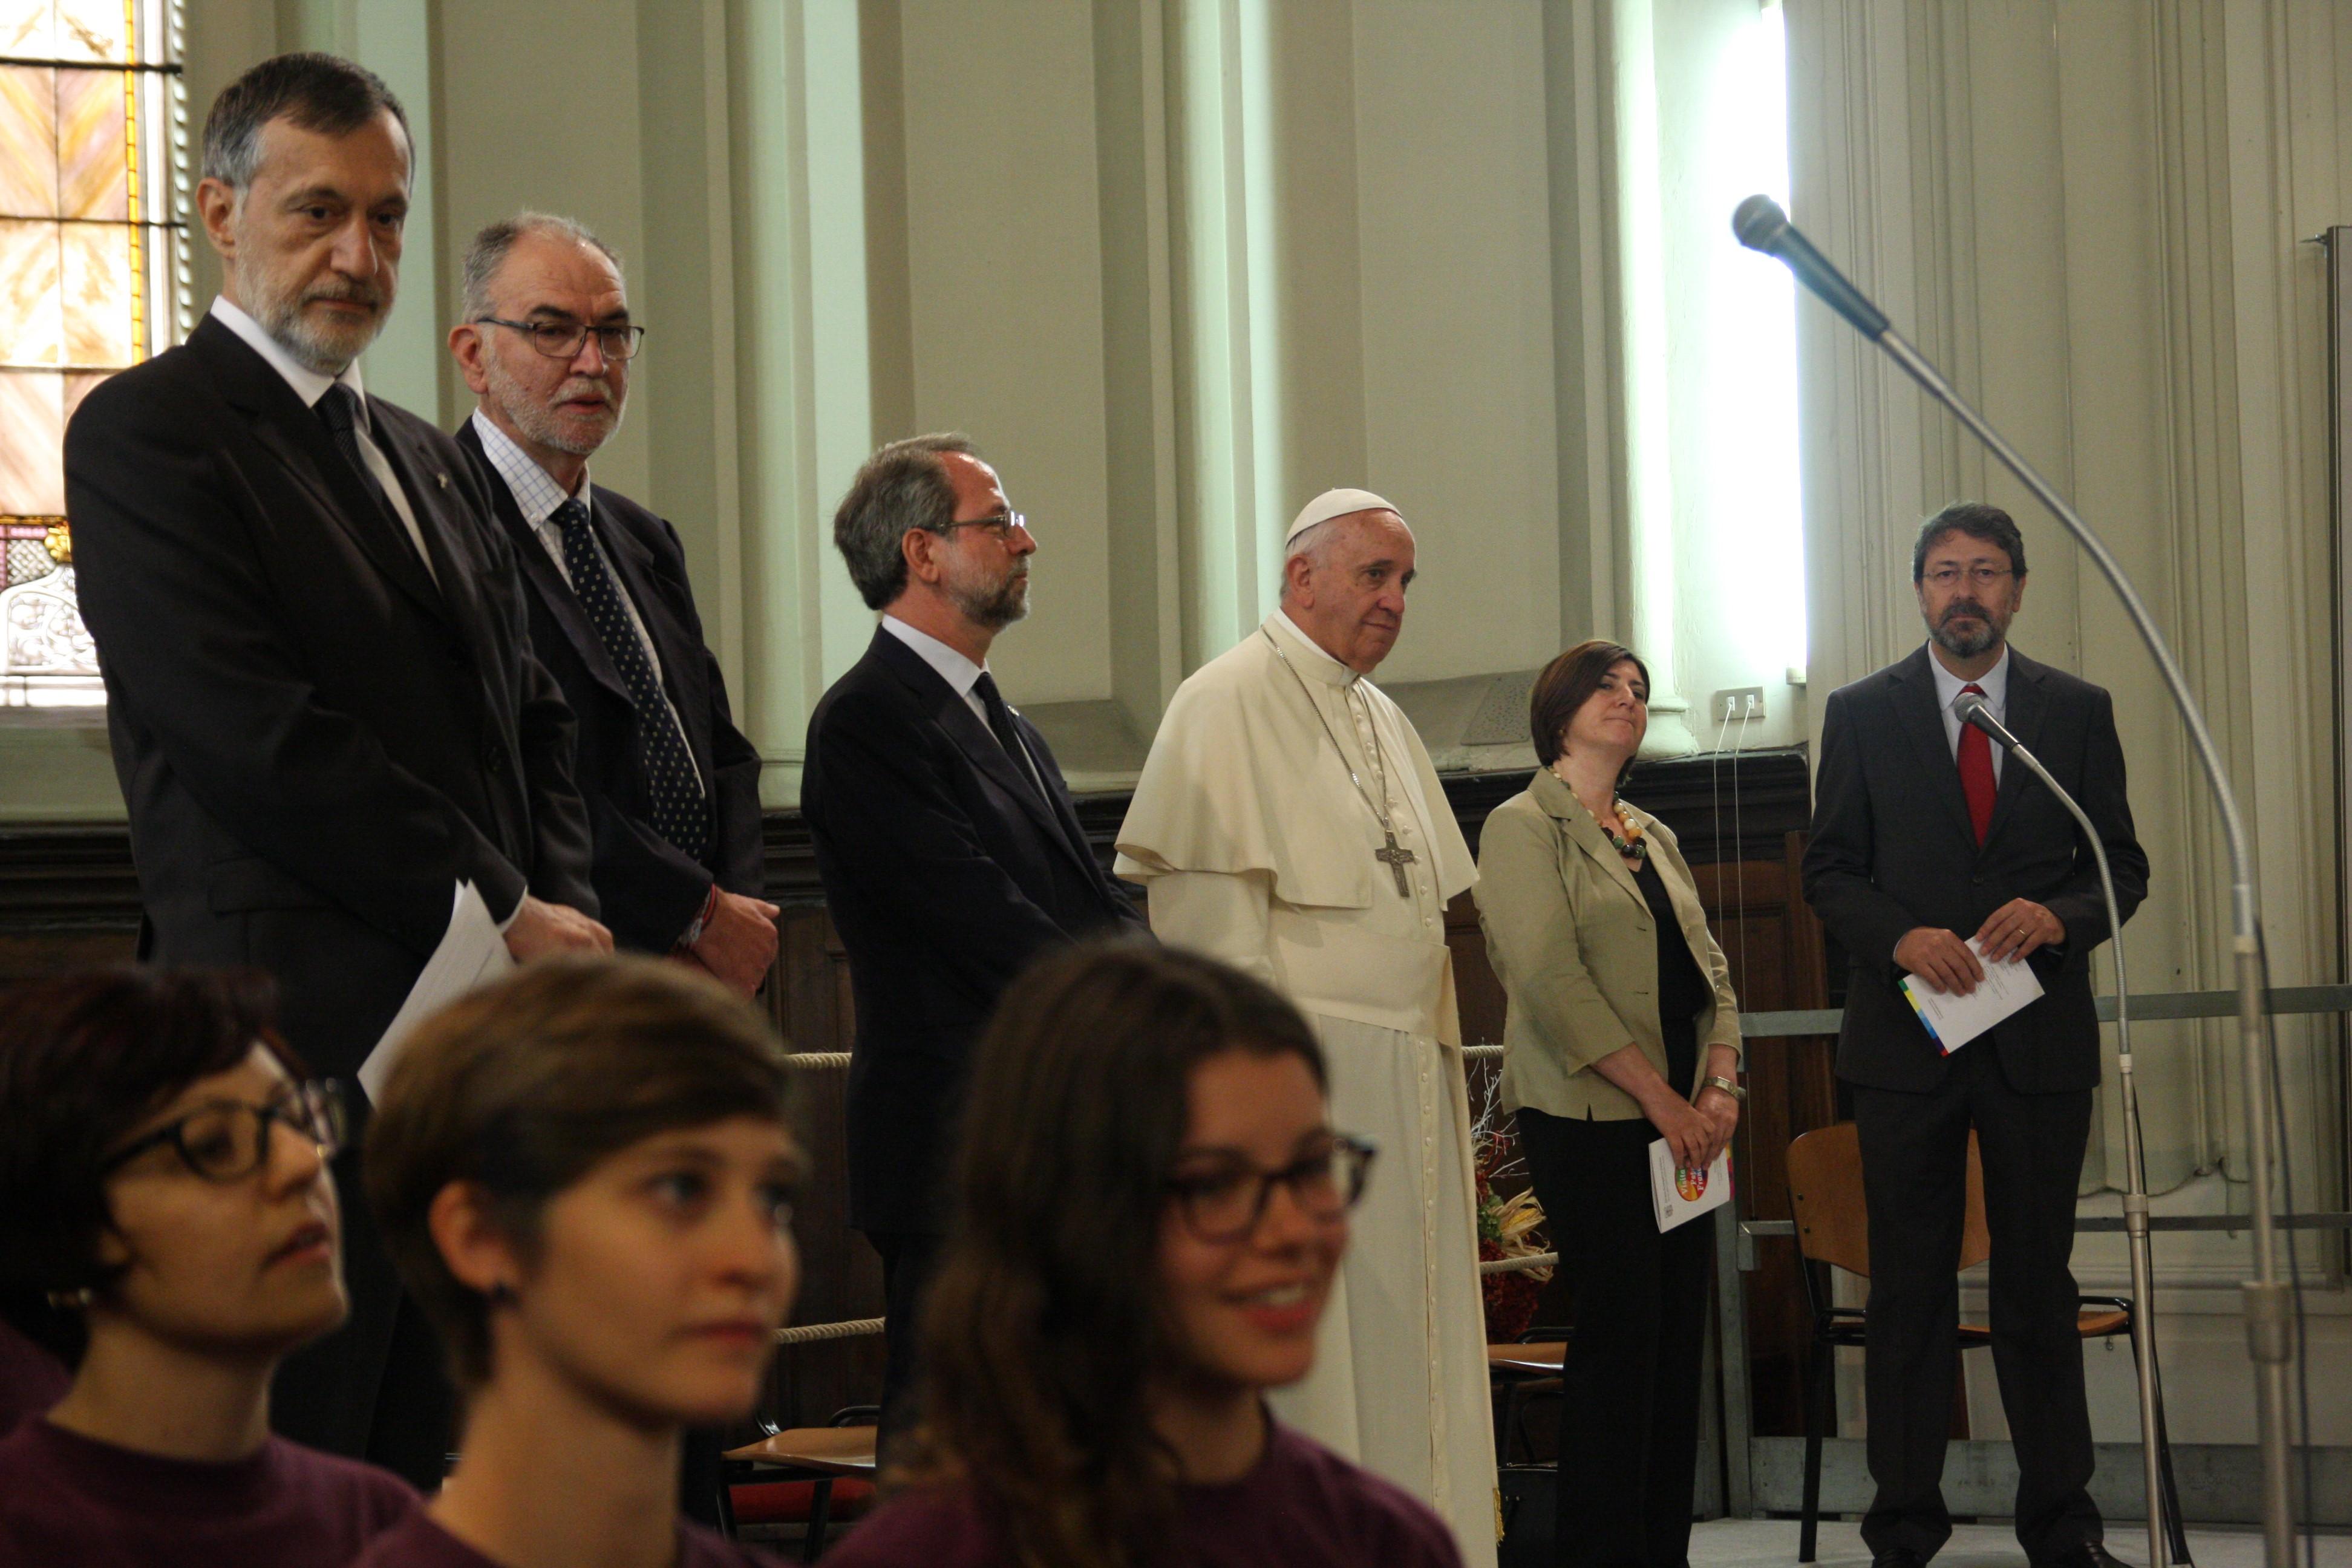 Visite du pape au temple vaudois de Turin (le 22 juin 2015). © Riforma/Pietro Romeo